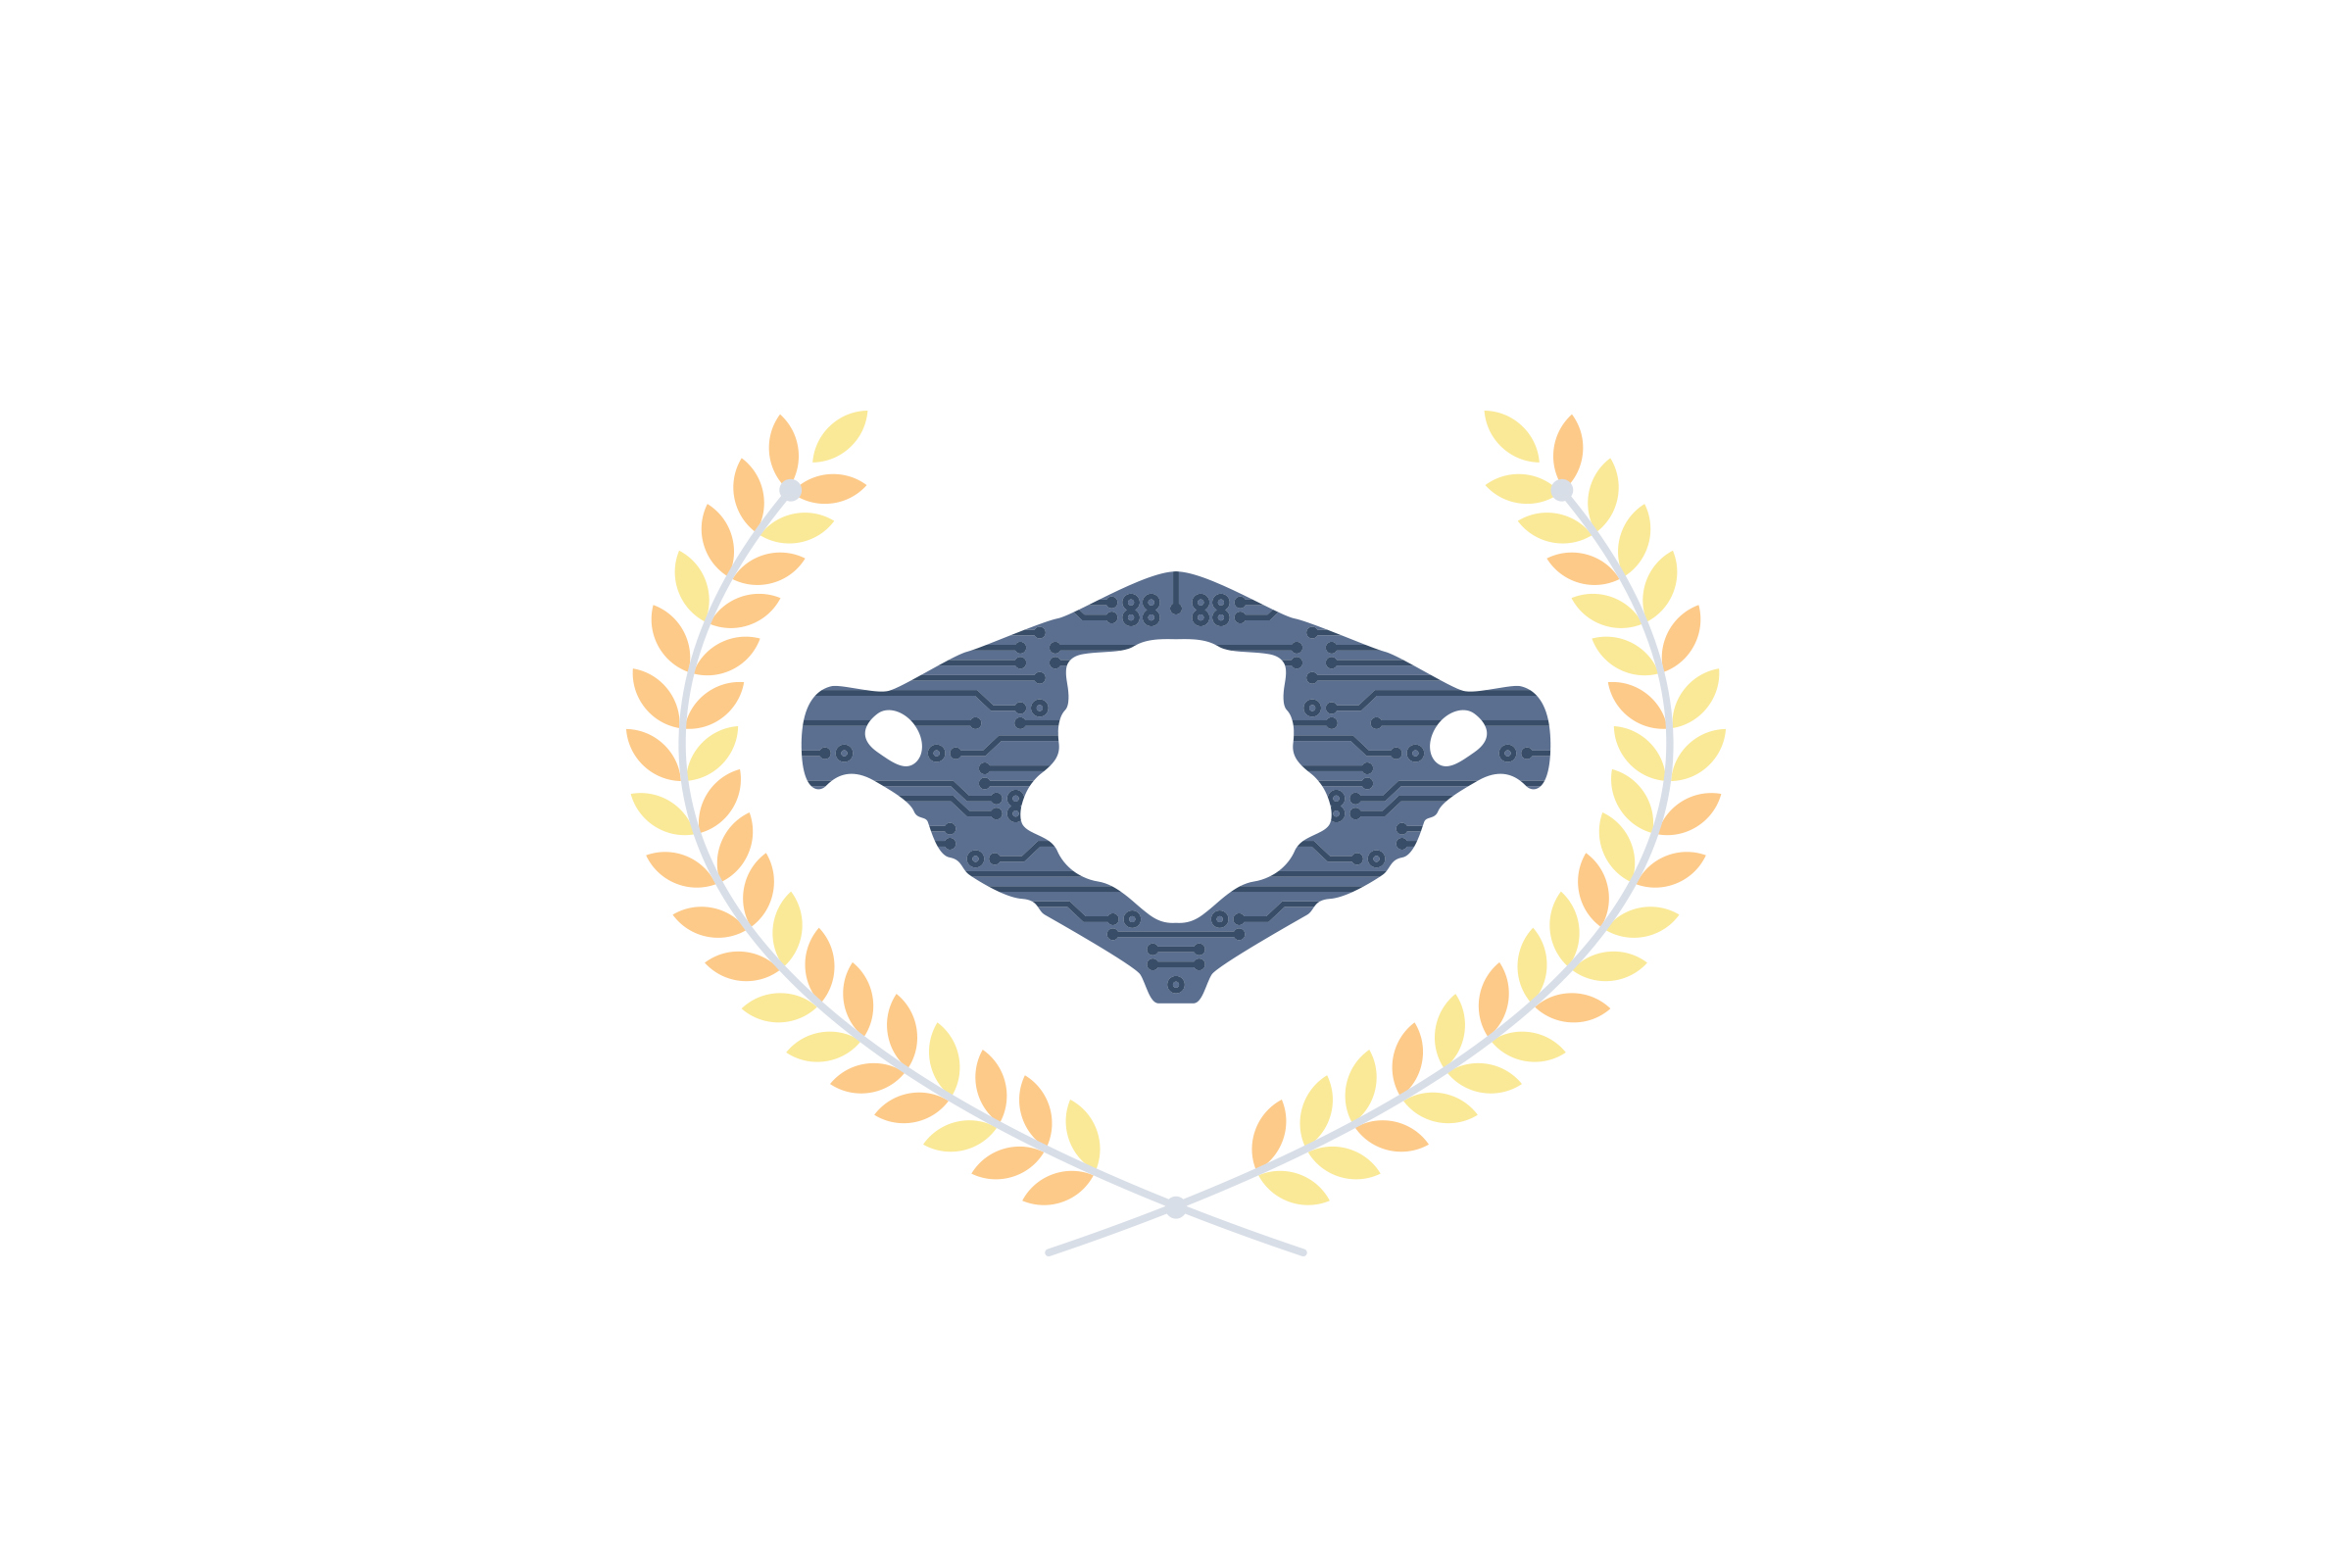 hearthfire-creative-logo-brand-identity-designer-denver-colorado-atlanta-upper-cervical-chiropractic-2.jpg